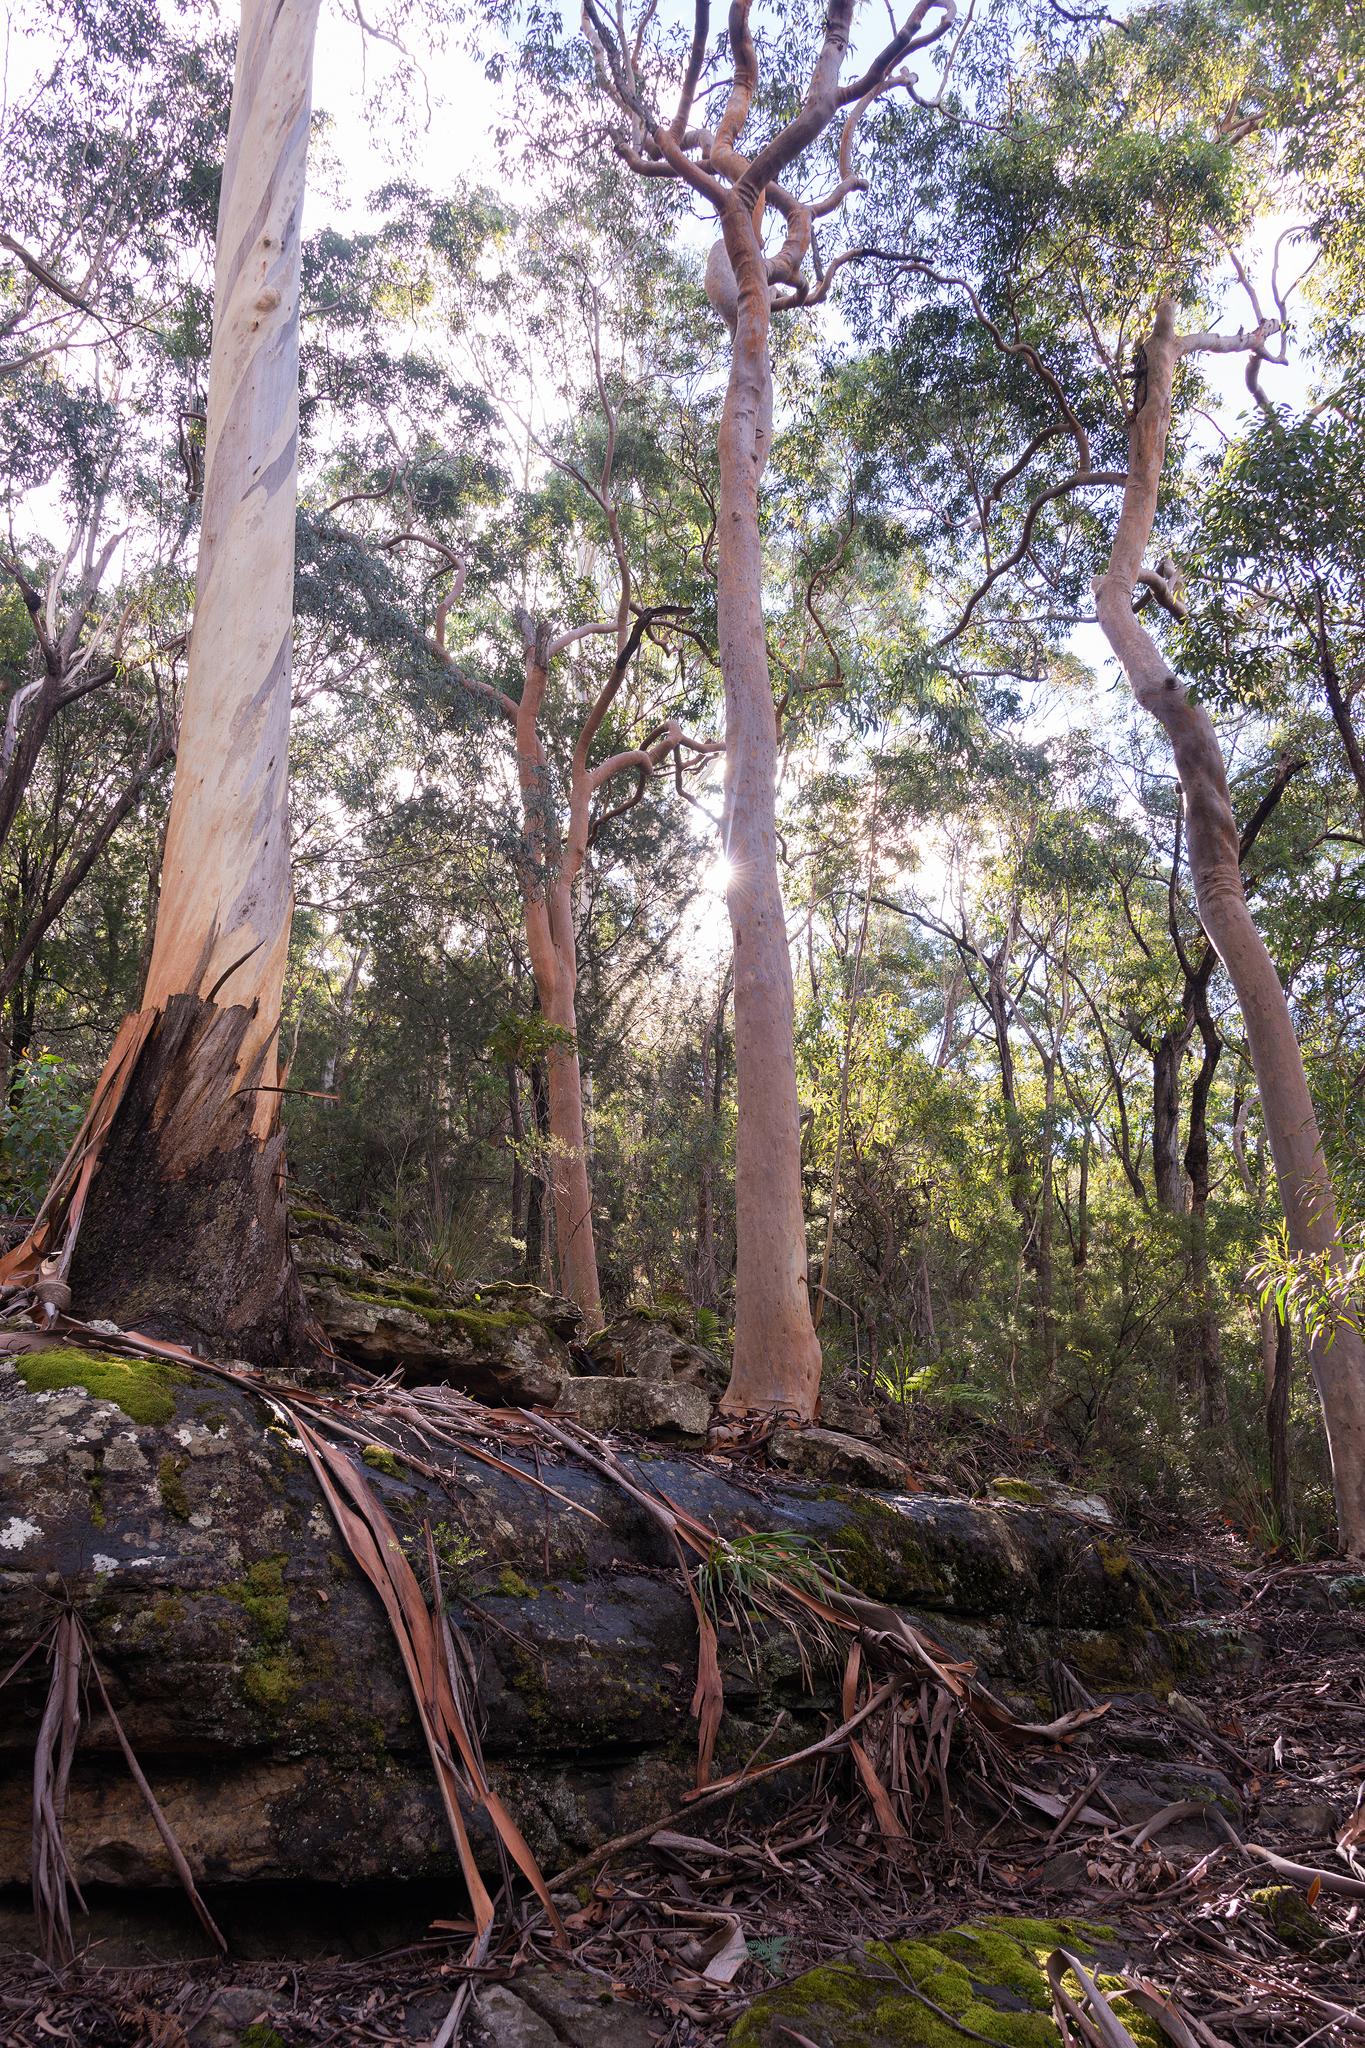 Chinaman's gap eucalyptus trees